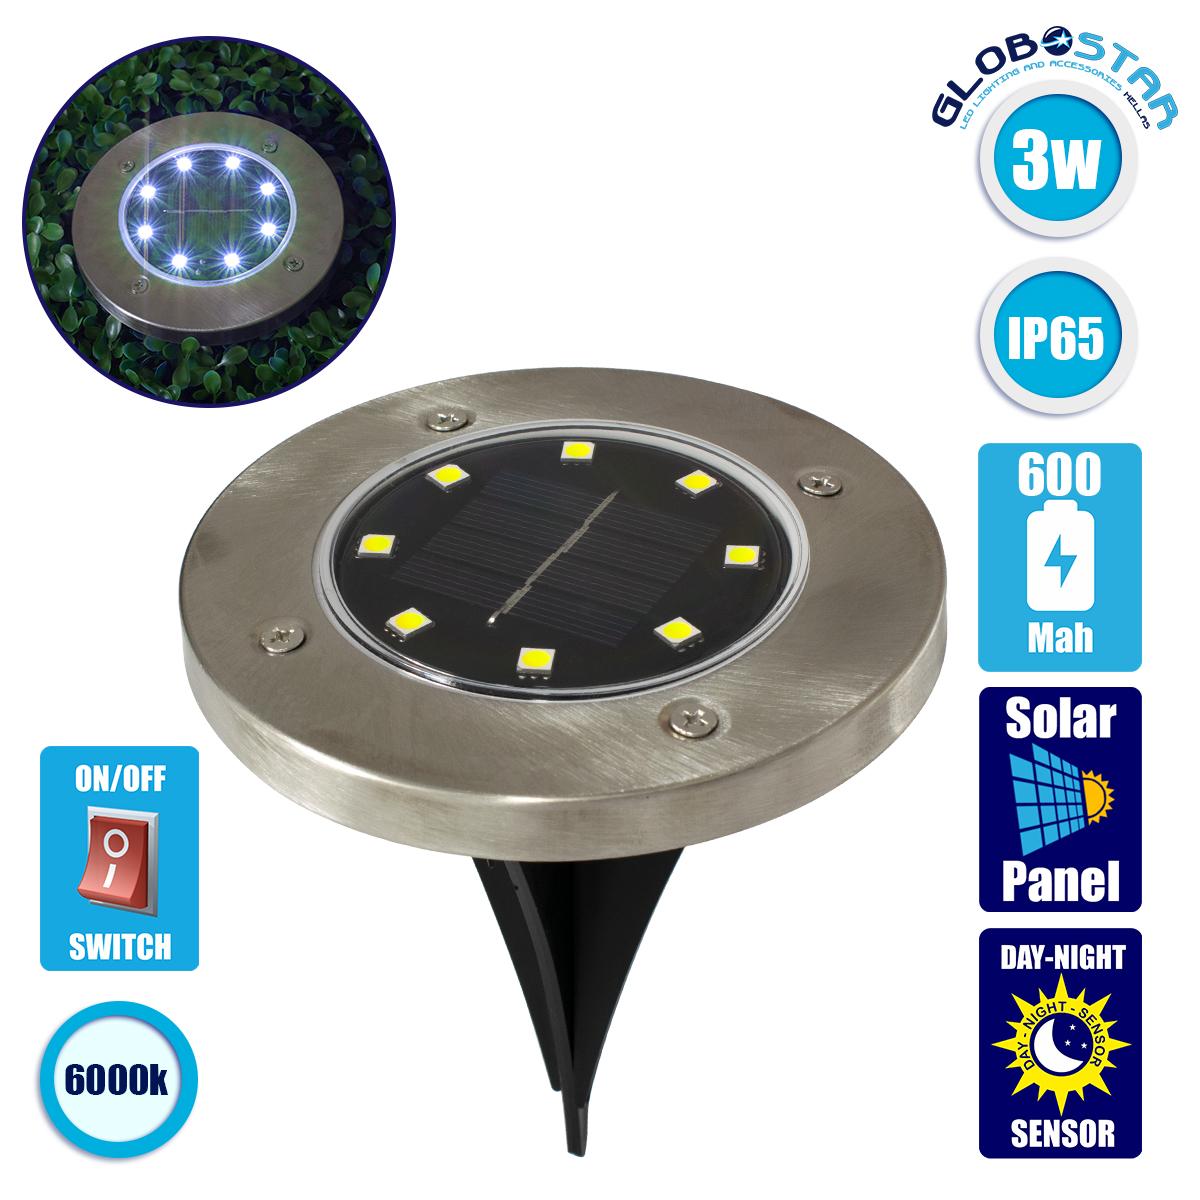 GloboStar® 71504 Αυτόνομο Ηλιακό Φωτιστικό Κήπου LED SMD 3W 200 lm με Ενσωματωμένη Μπαταρία 600mAh - Φωτοβολταϊκό Πάνελ με Αισθητήρα Ημέρας-Νύχτας IP65 Ψυχρό Λευκό 6000k